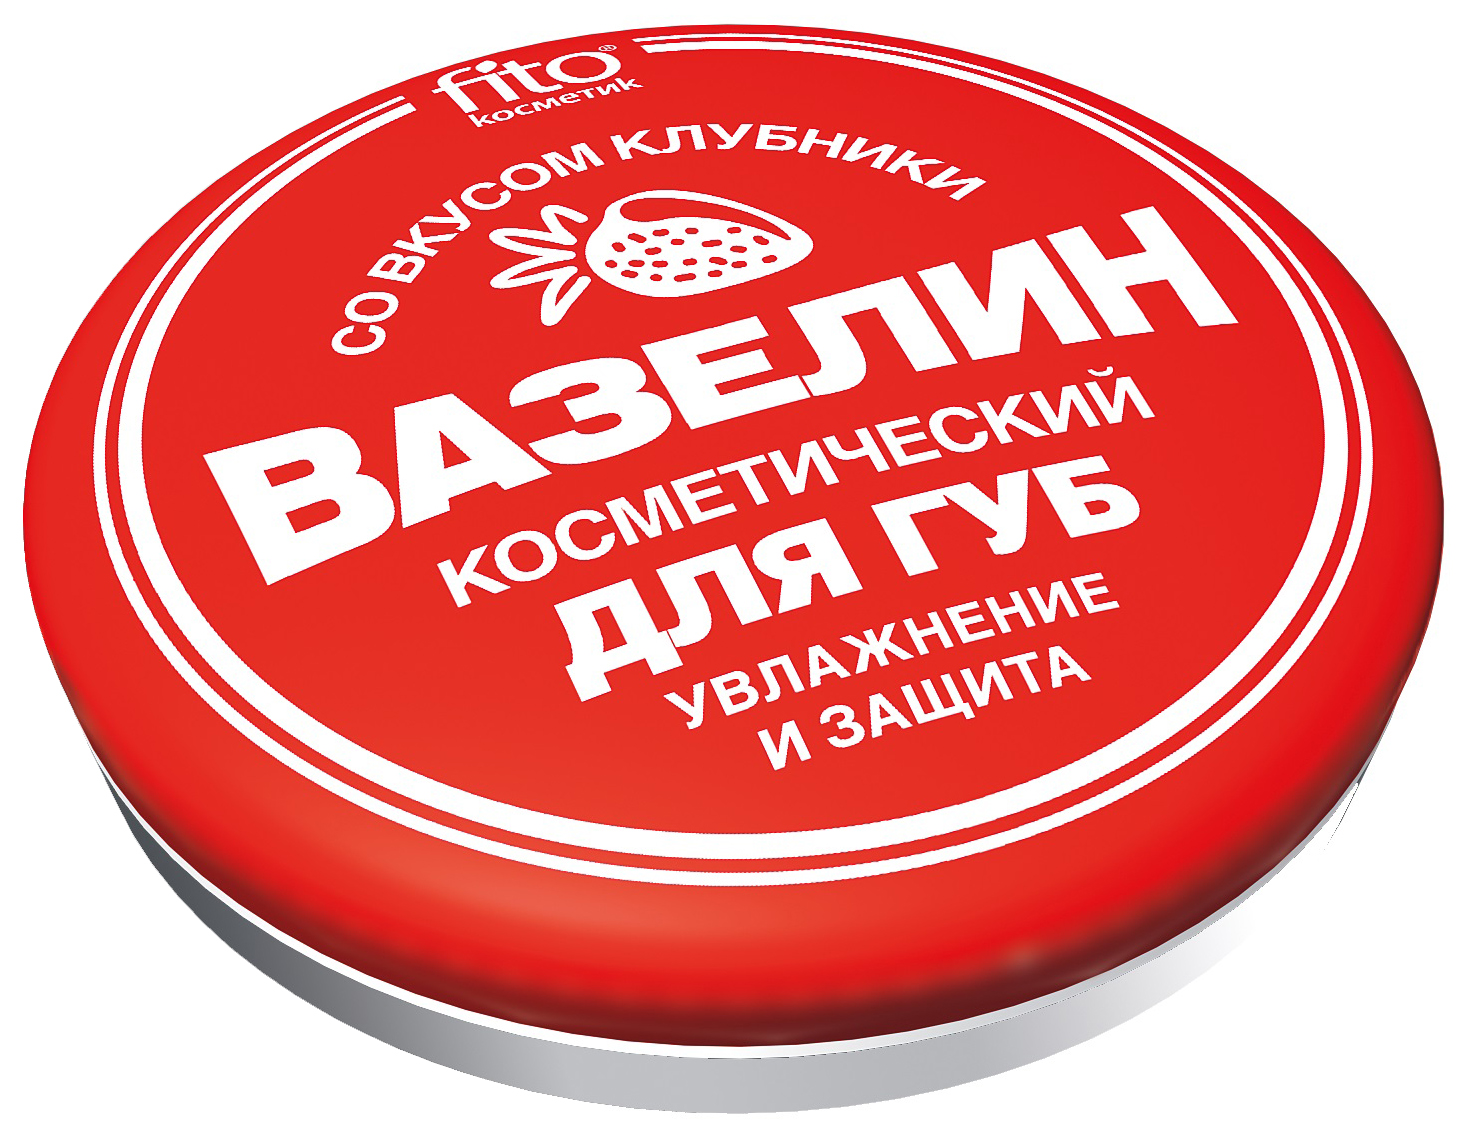 Вазелин косметический Fito Косметик со вкусом клубники